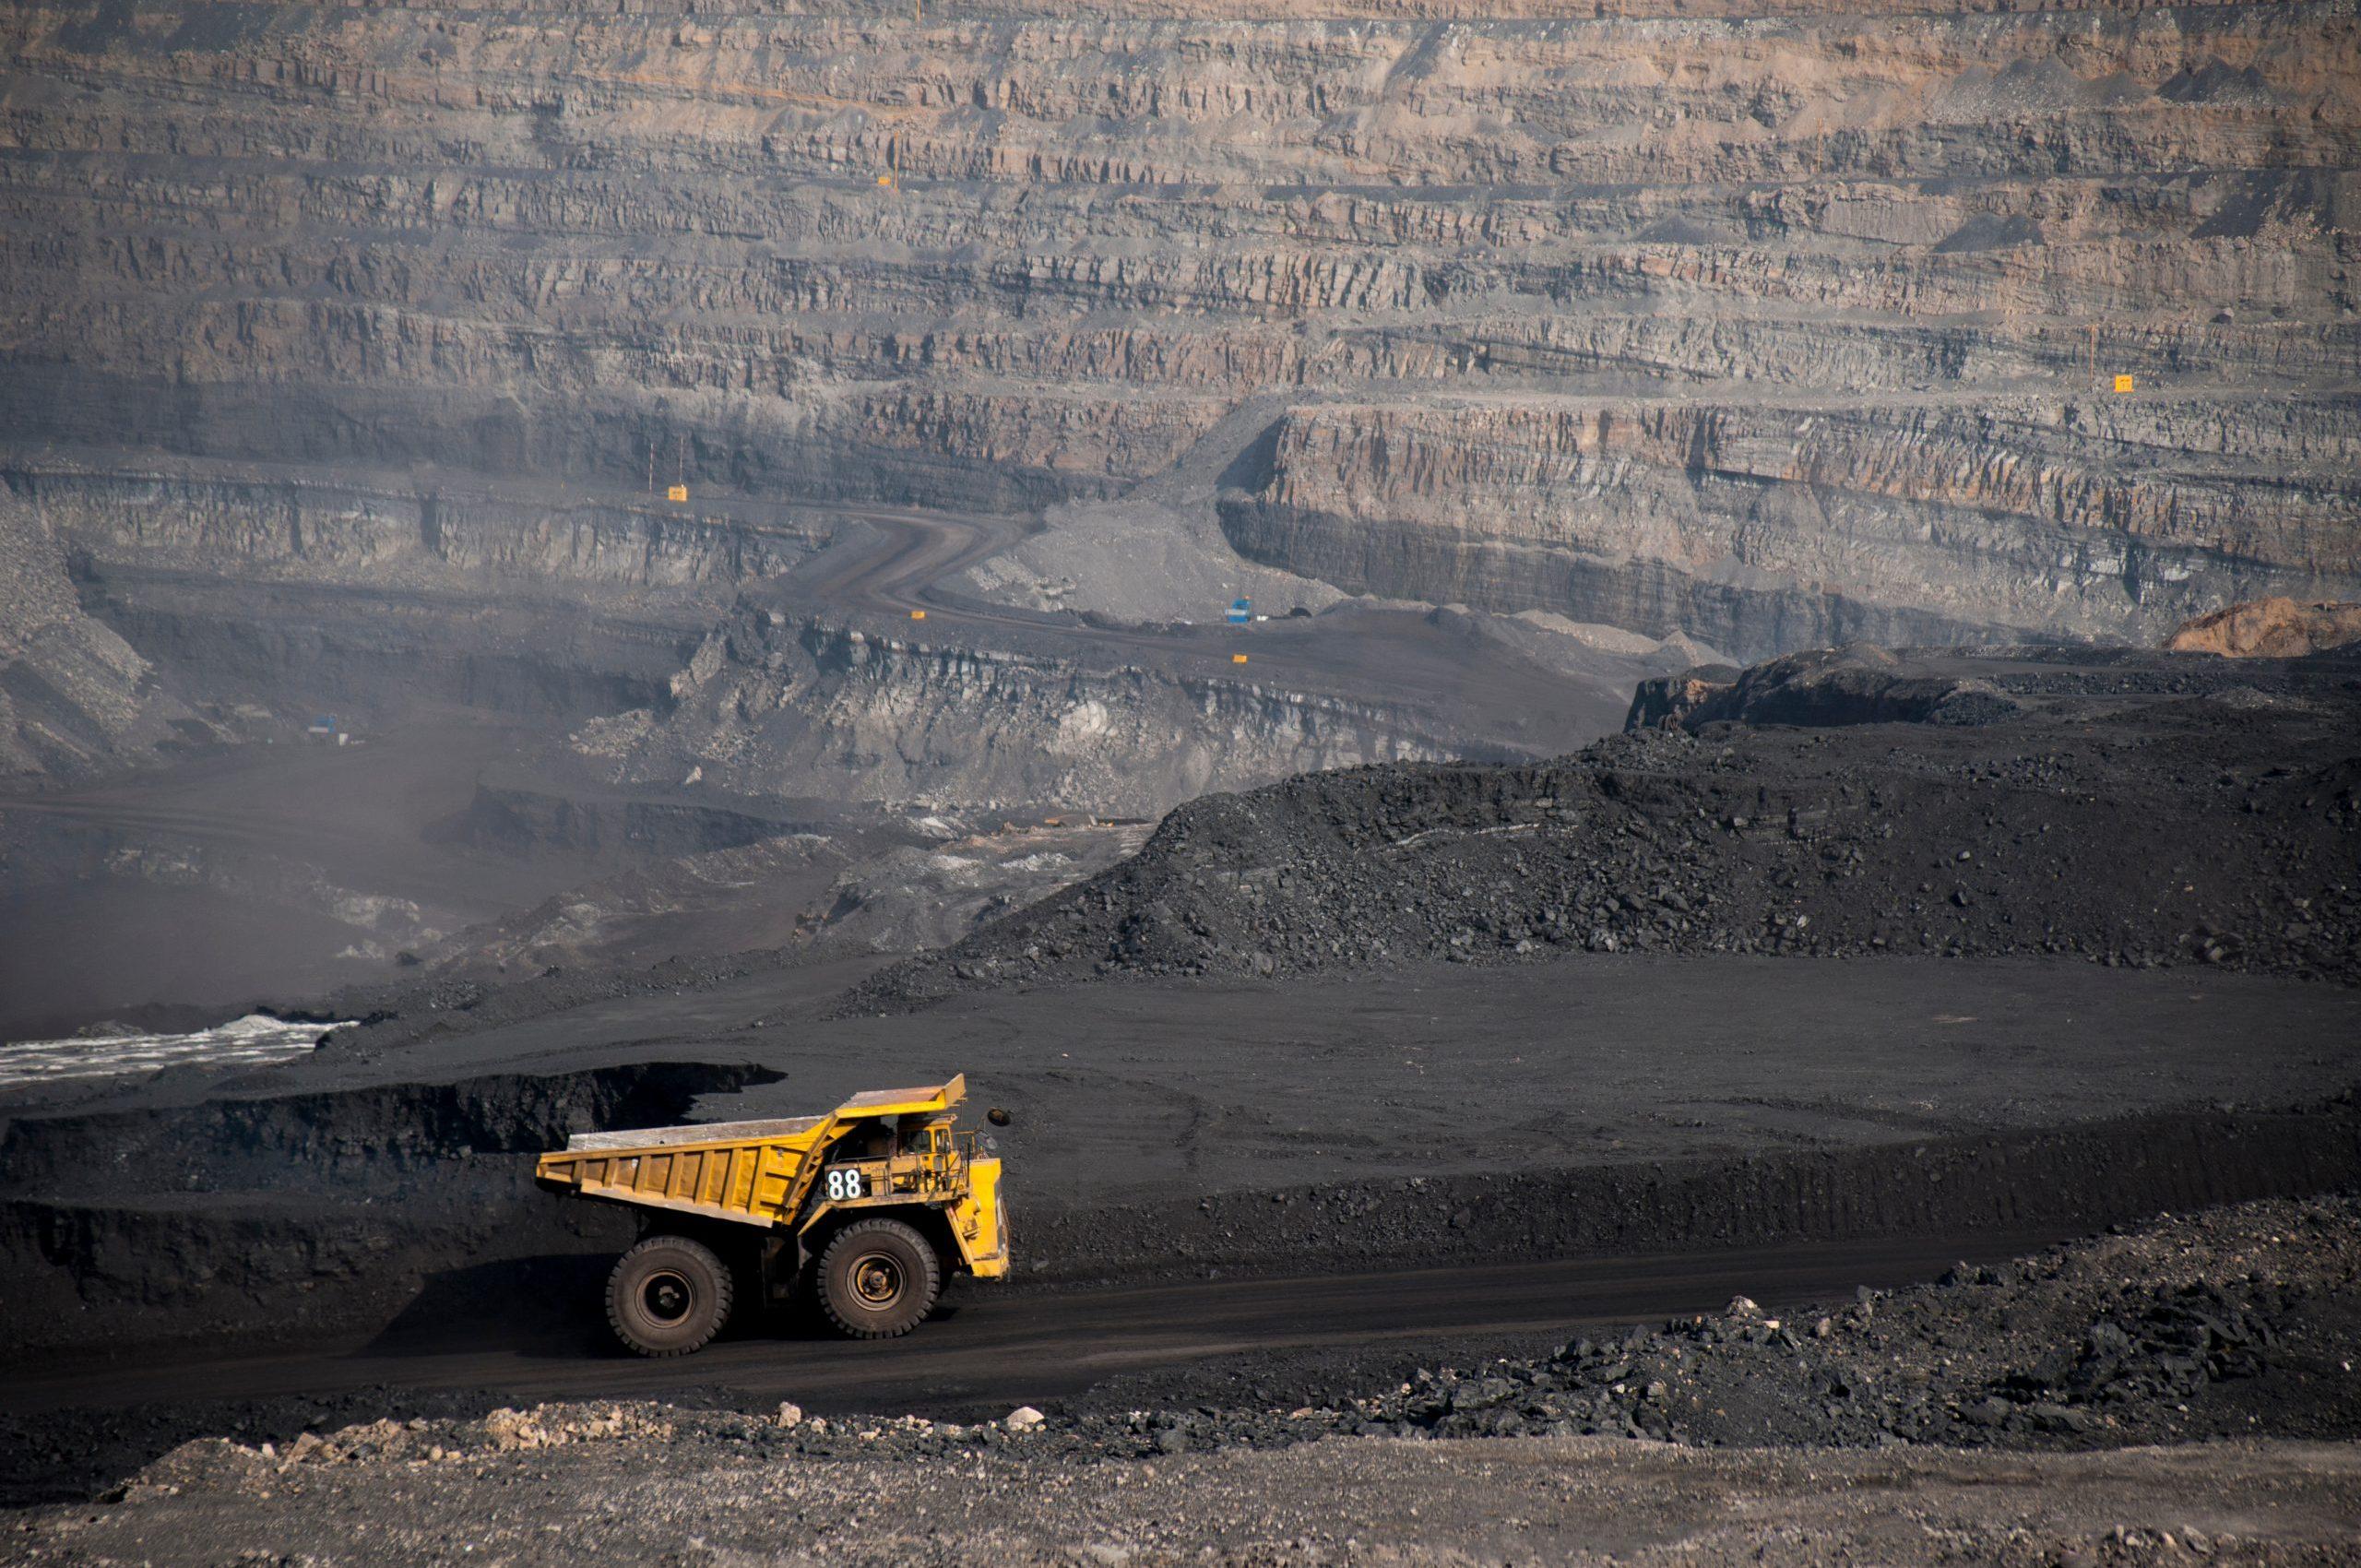 rmda-ss-energy-industry-mining-dump-truck.2560.1703